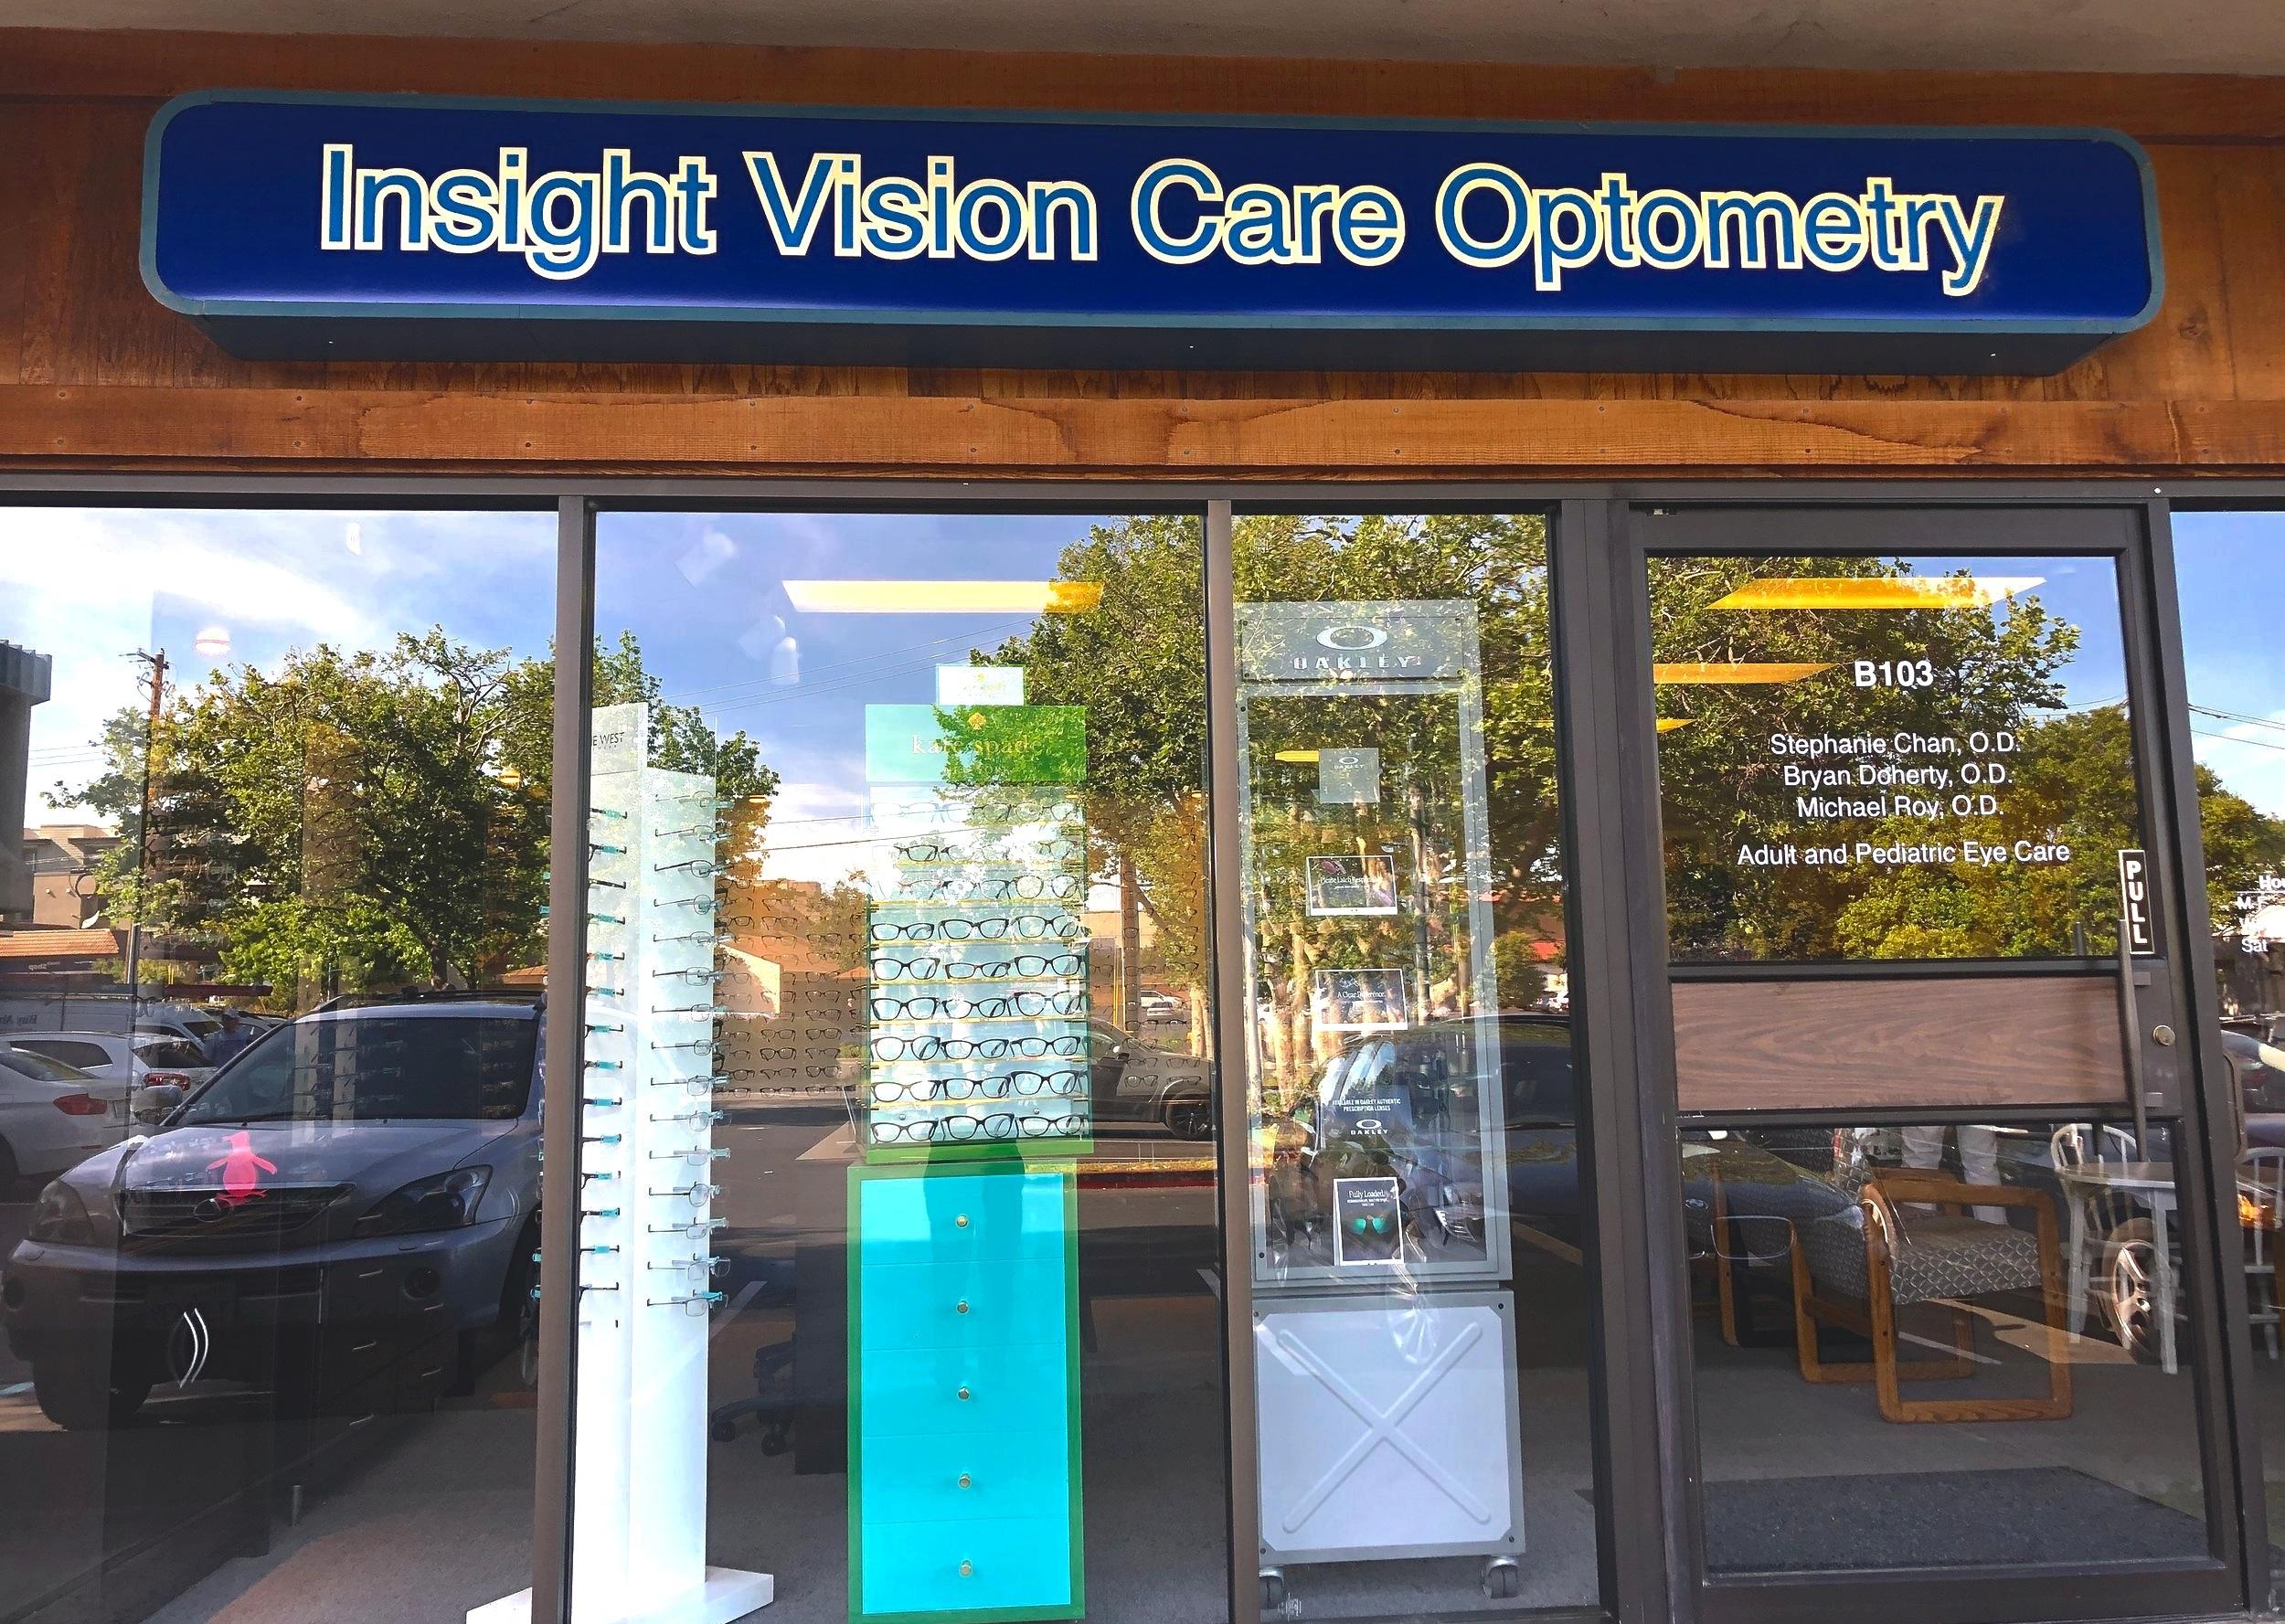 - Insight Vision Care Optometry675 Ygnacio Valley RoadSuite B103Walnut Creek, California 94596Office: (925) 933-4700Fax: (925) 933-4721